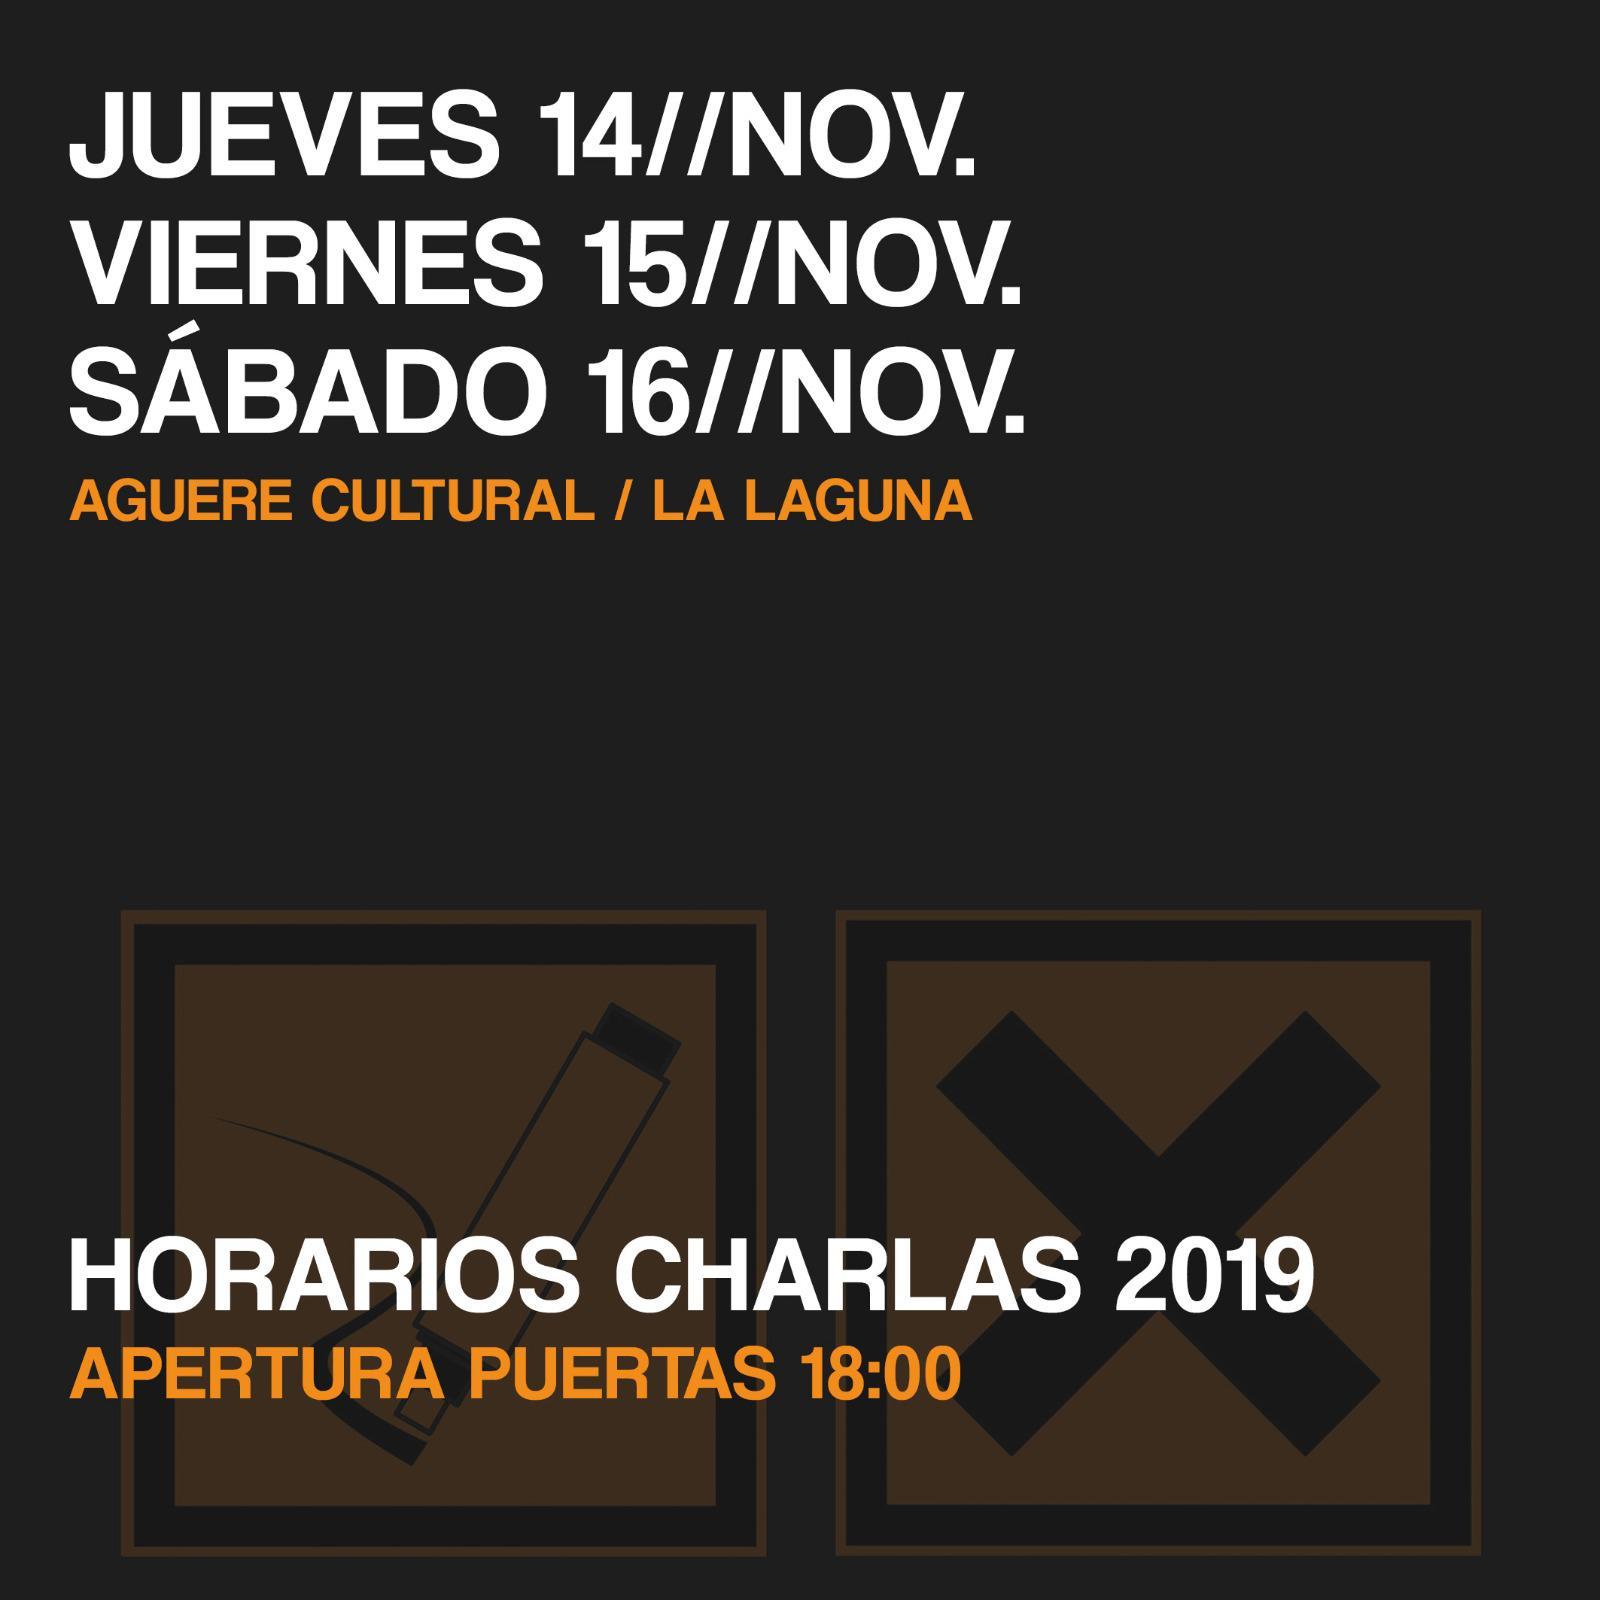 II Jornadas de Muros Libres sobre graffiti y street arte en el Aguere Cultural